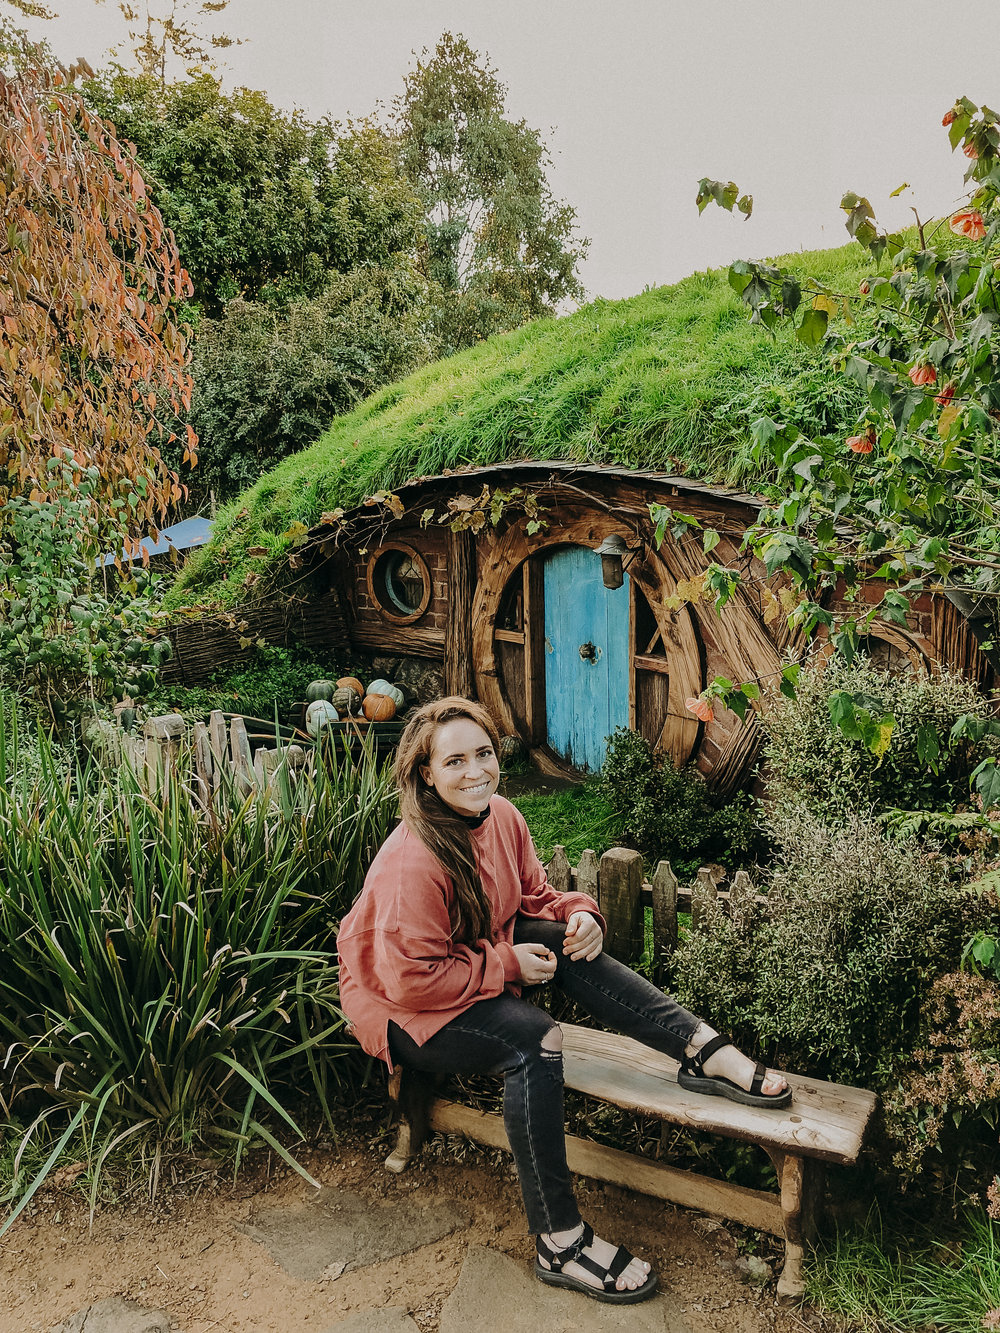 visit-hobbiton-things-to-do-new-zealand-23.jpg